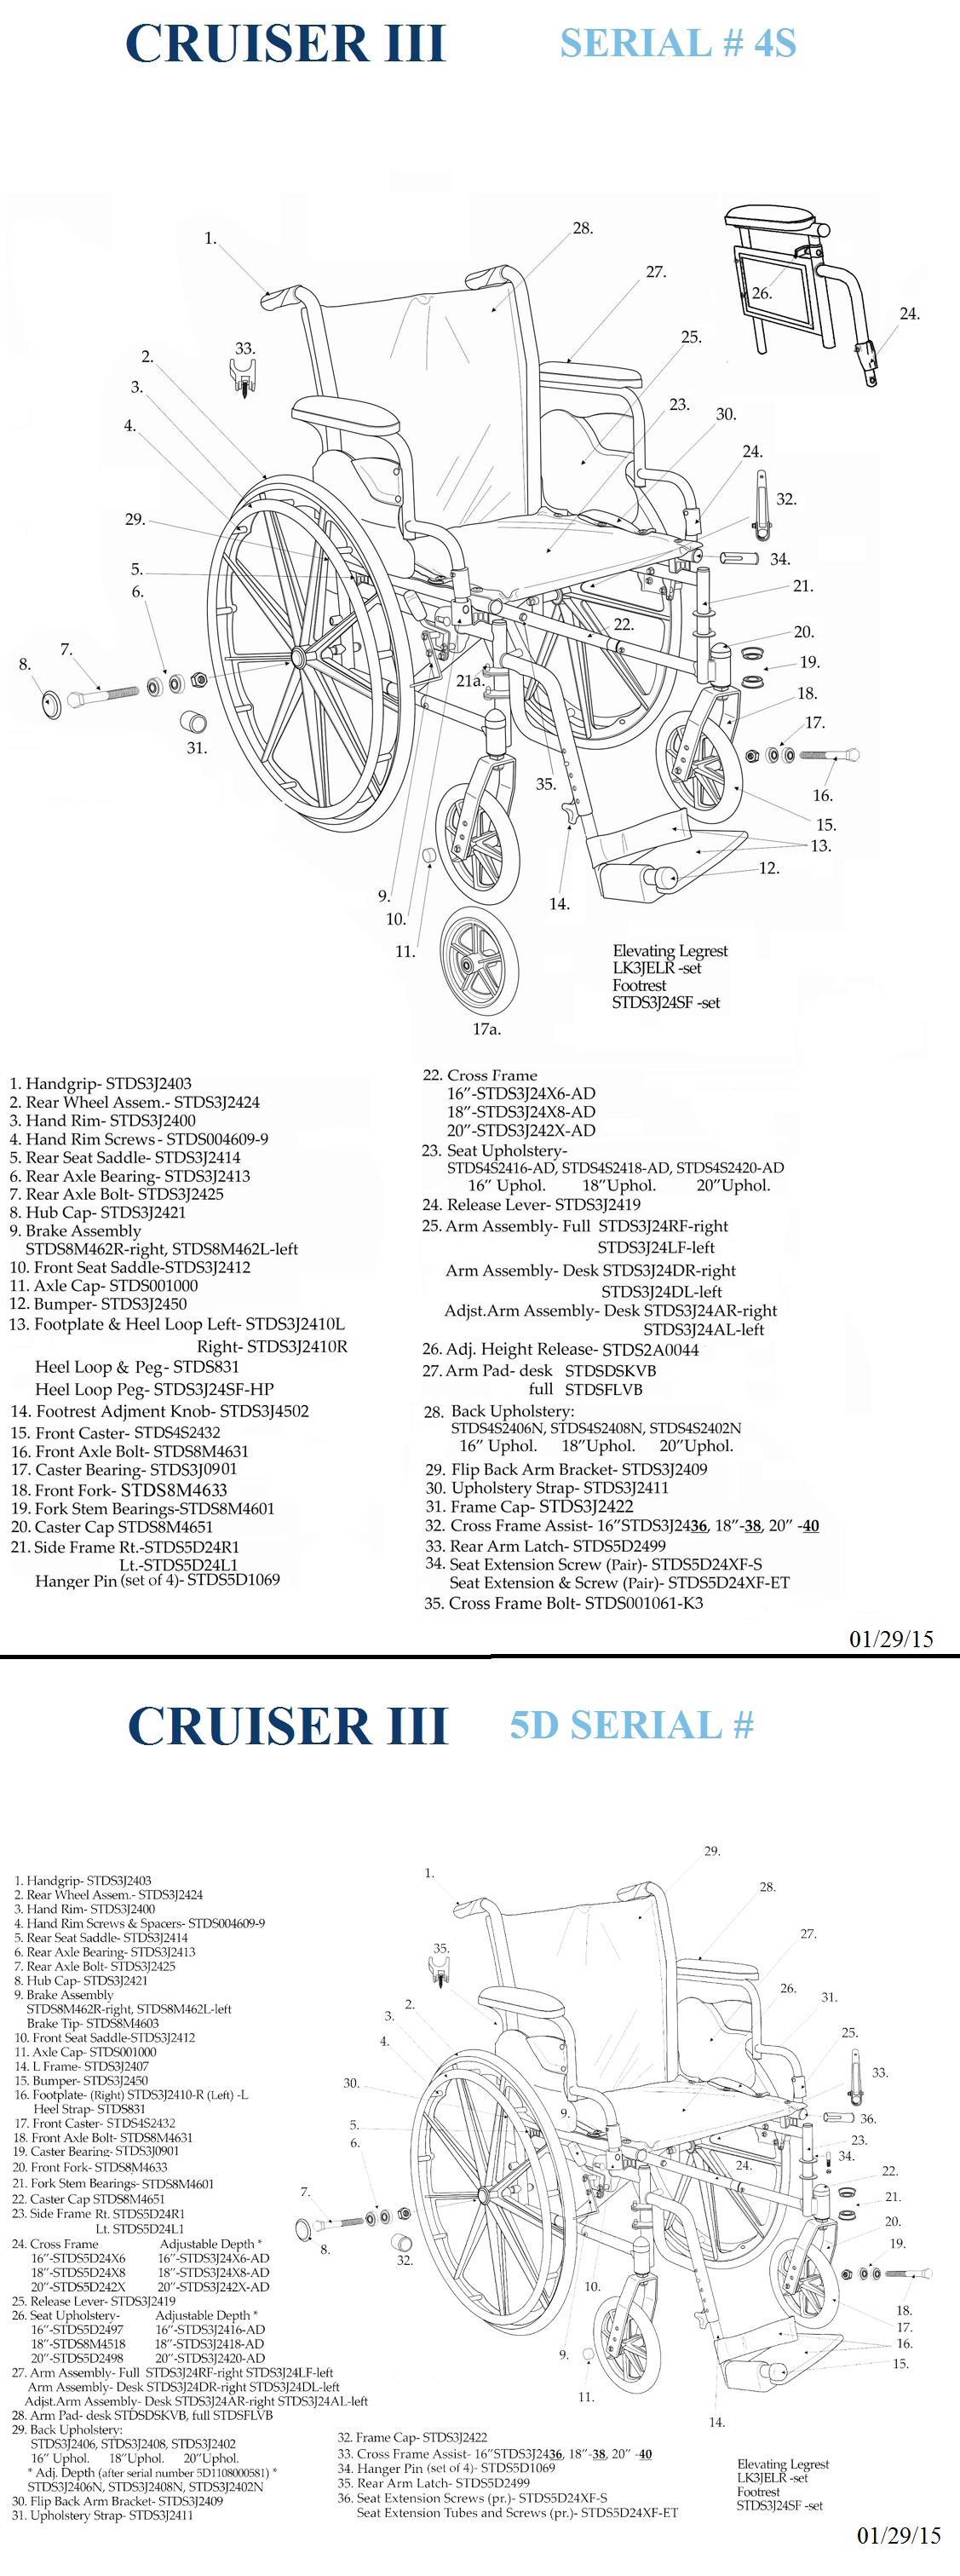 Cruiser III Dual Axle Wheelchair on Sale! [Save Up to 30%]